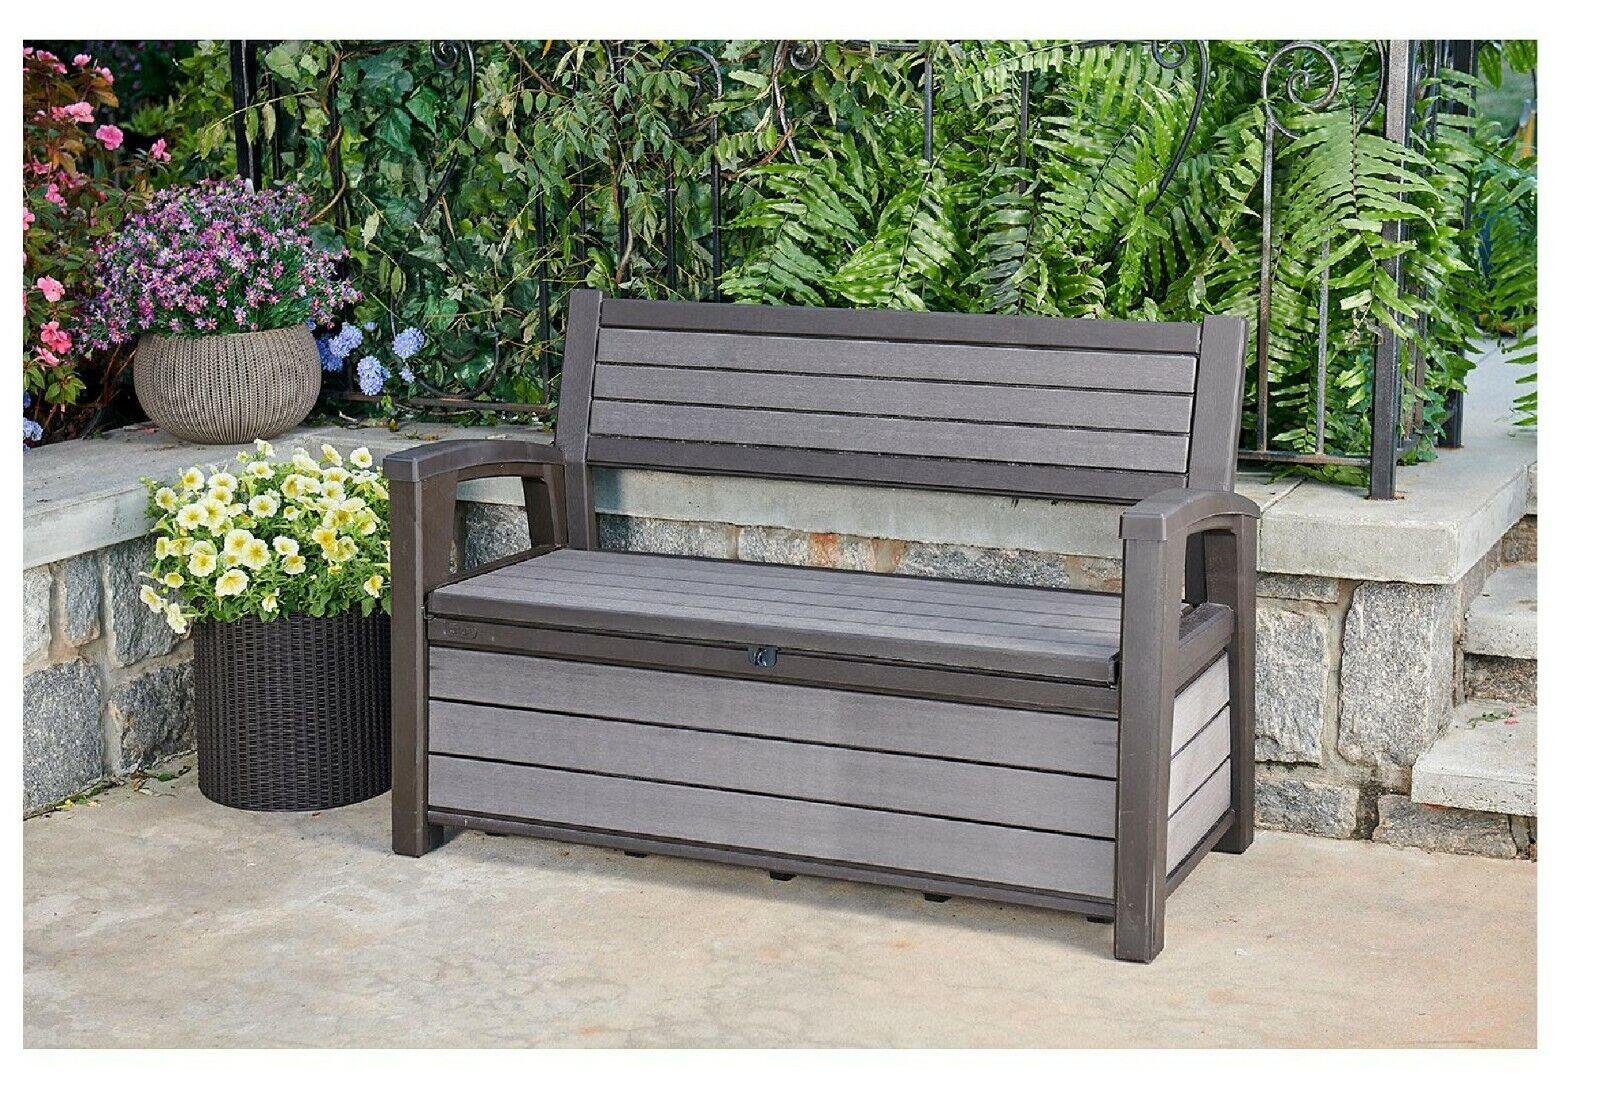 Keter Hudson Plastic Storage Bench 60 Gallon Deck Box, Grey